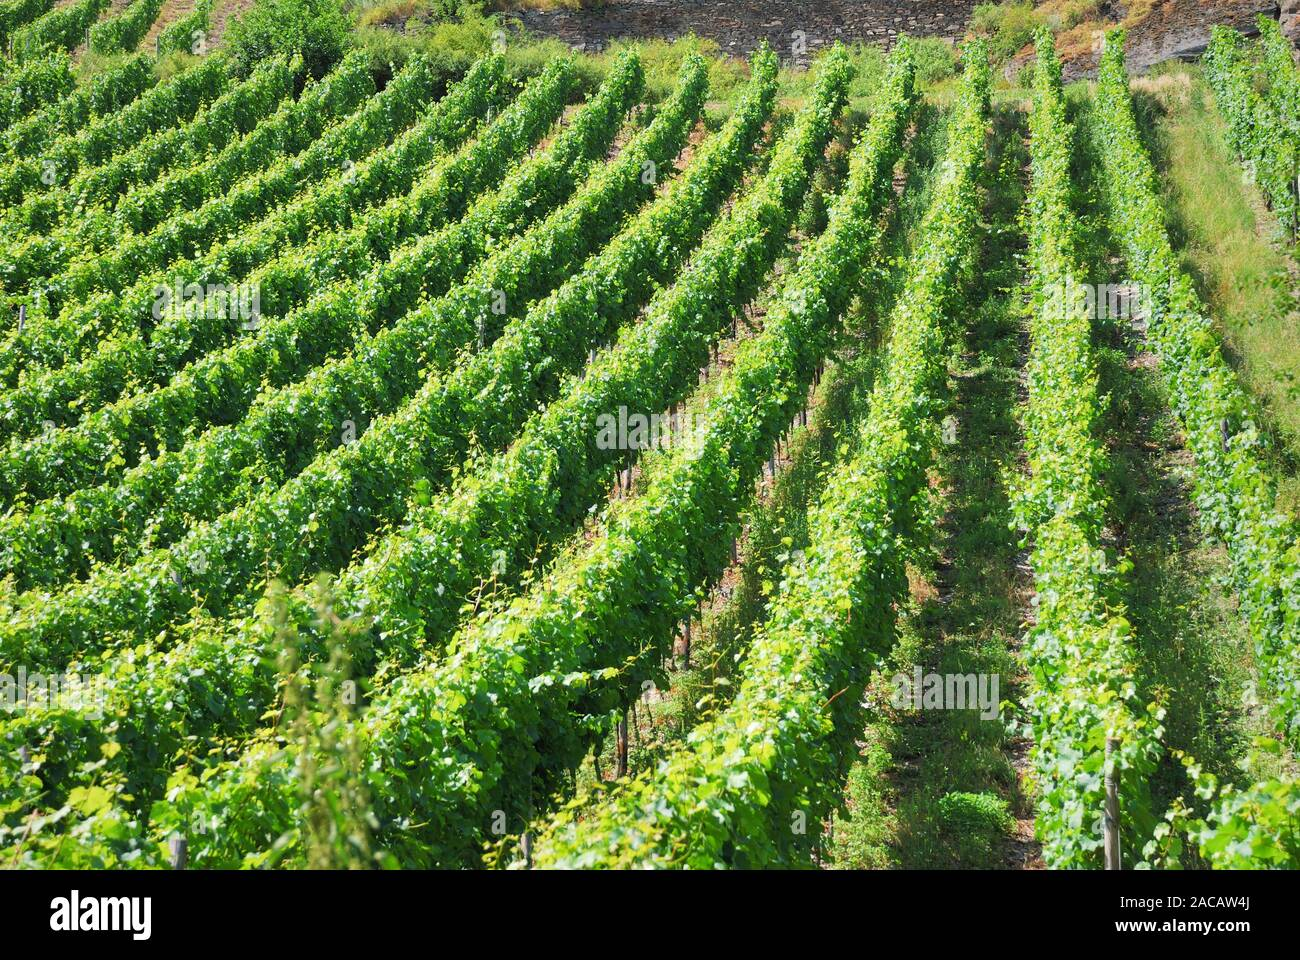 View of Weinberg, Romantic Rhine Valley, UNESCO World Heritage Upper Middle Rhine Valley, Rhineland-Palatinate, Germany, Europe Stock Photo